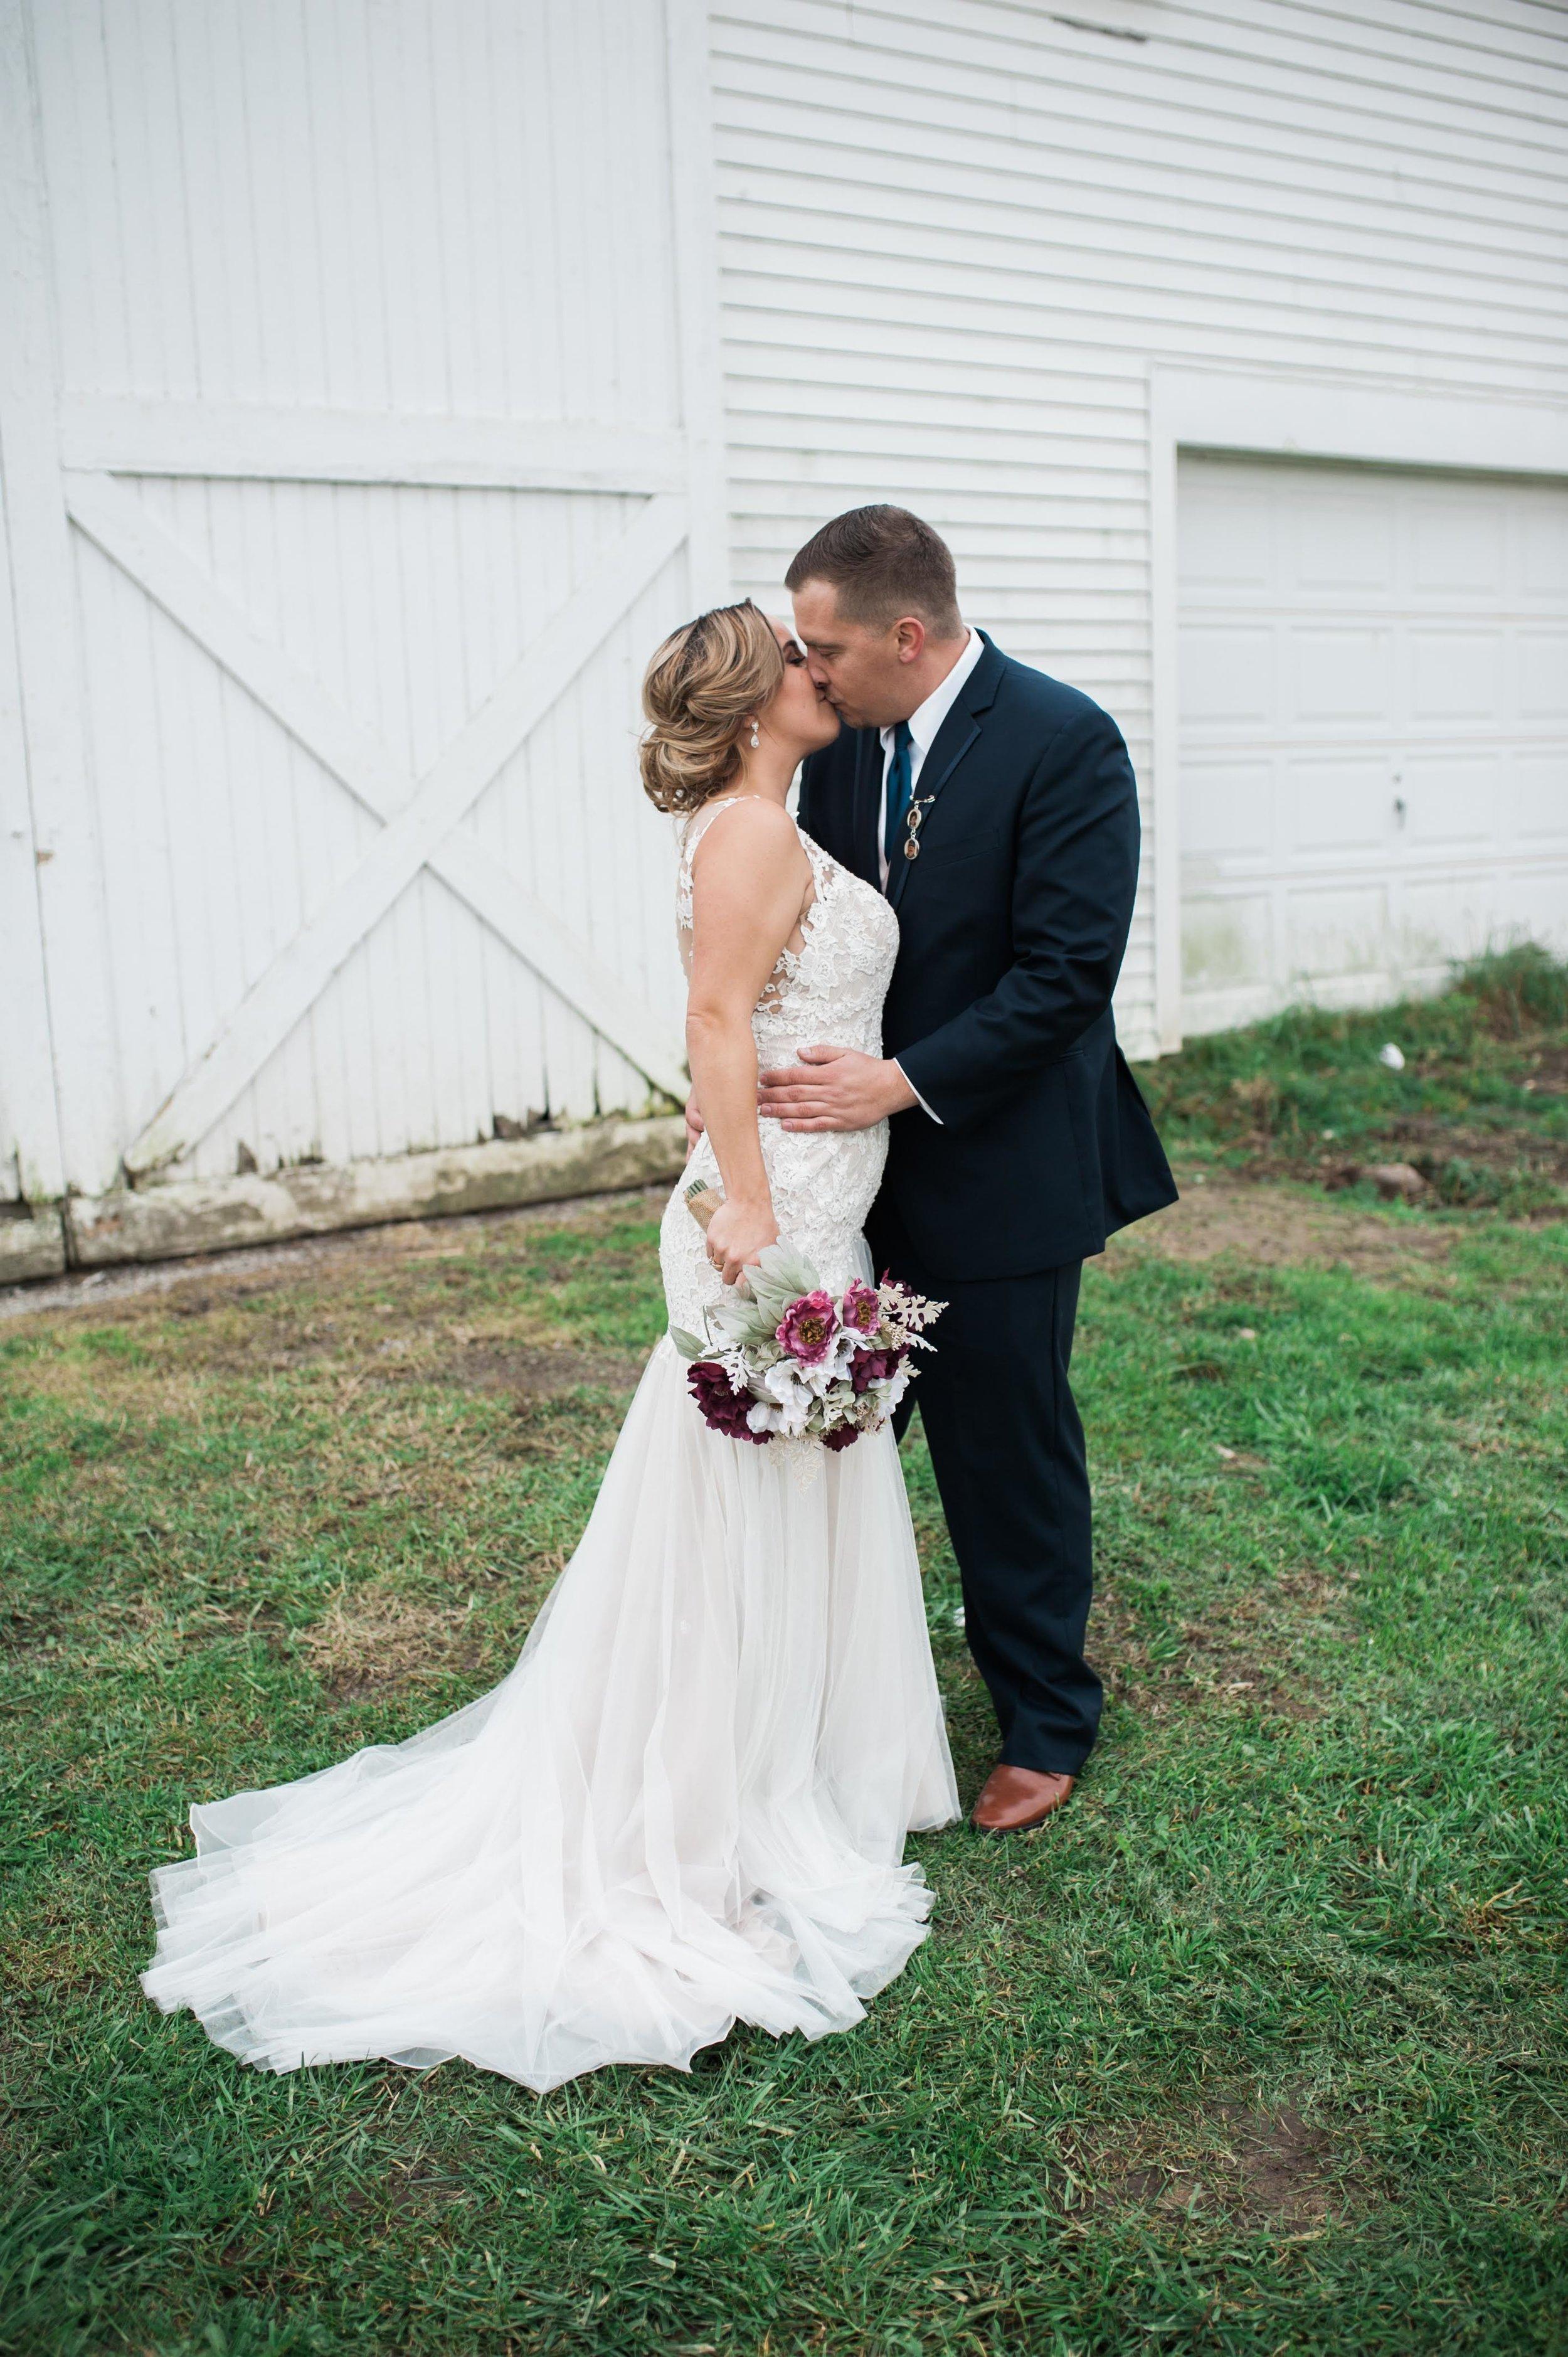 LLP Michigan Wedding Photographer 17.jpg